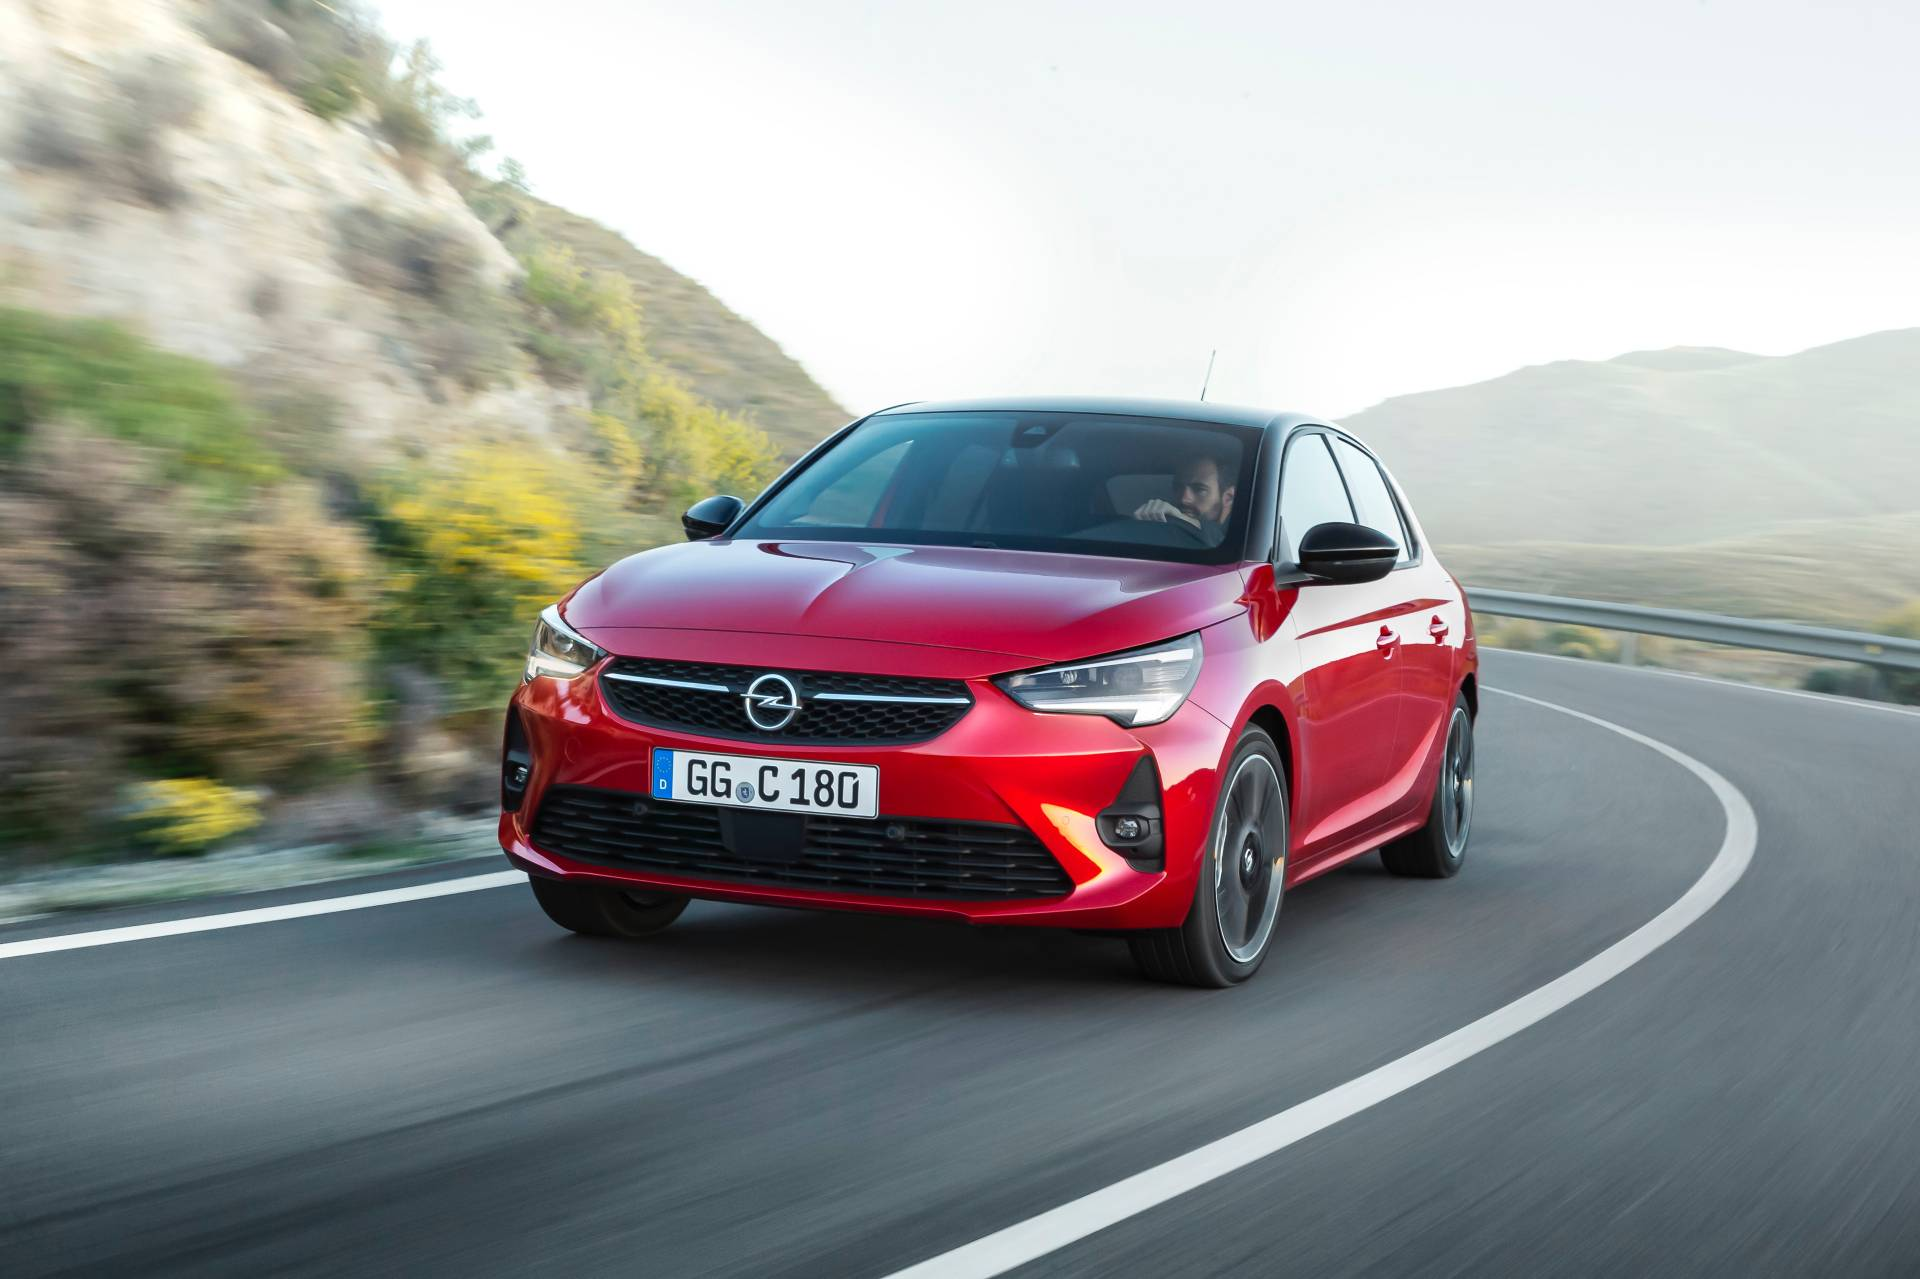 Opel Corsa à venda em Portugal dia 21 de novembro a partir de 15.510€